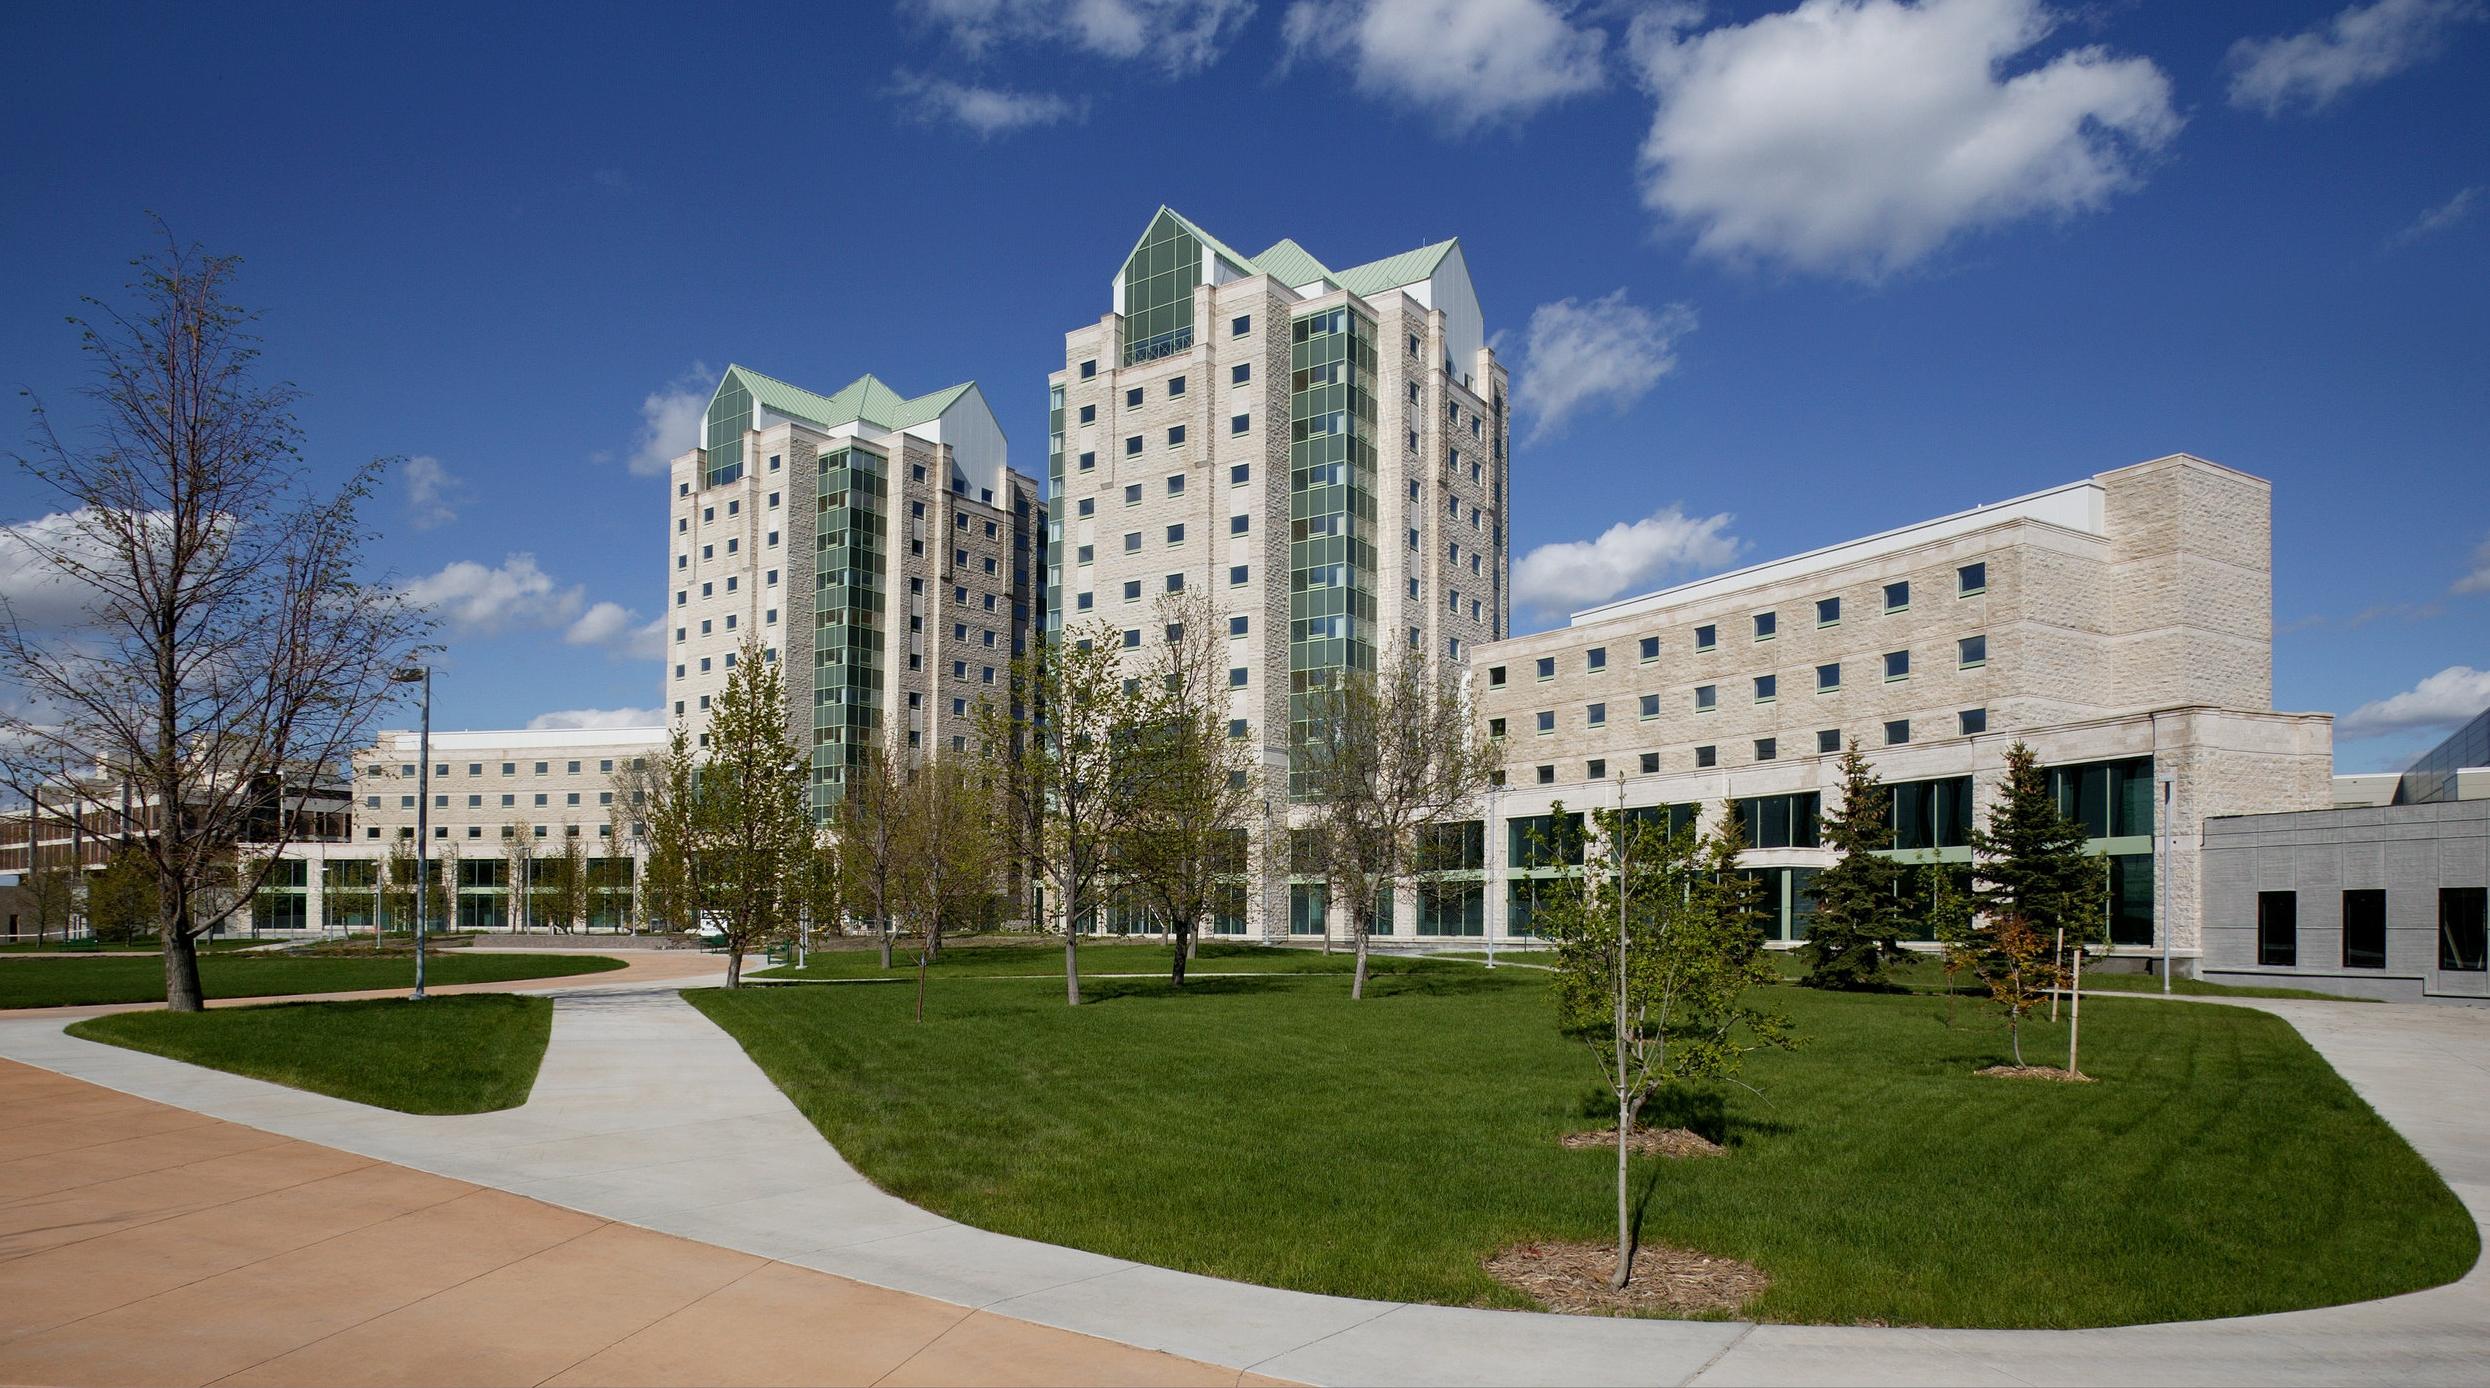 University of Regina, Paskwaw & Wakpa Towers - Regina, SK